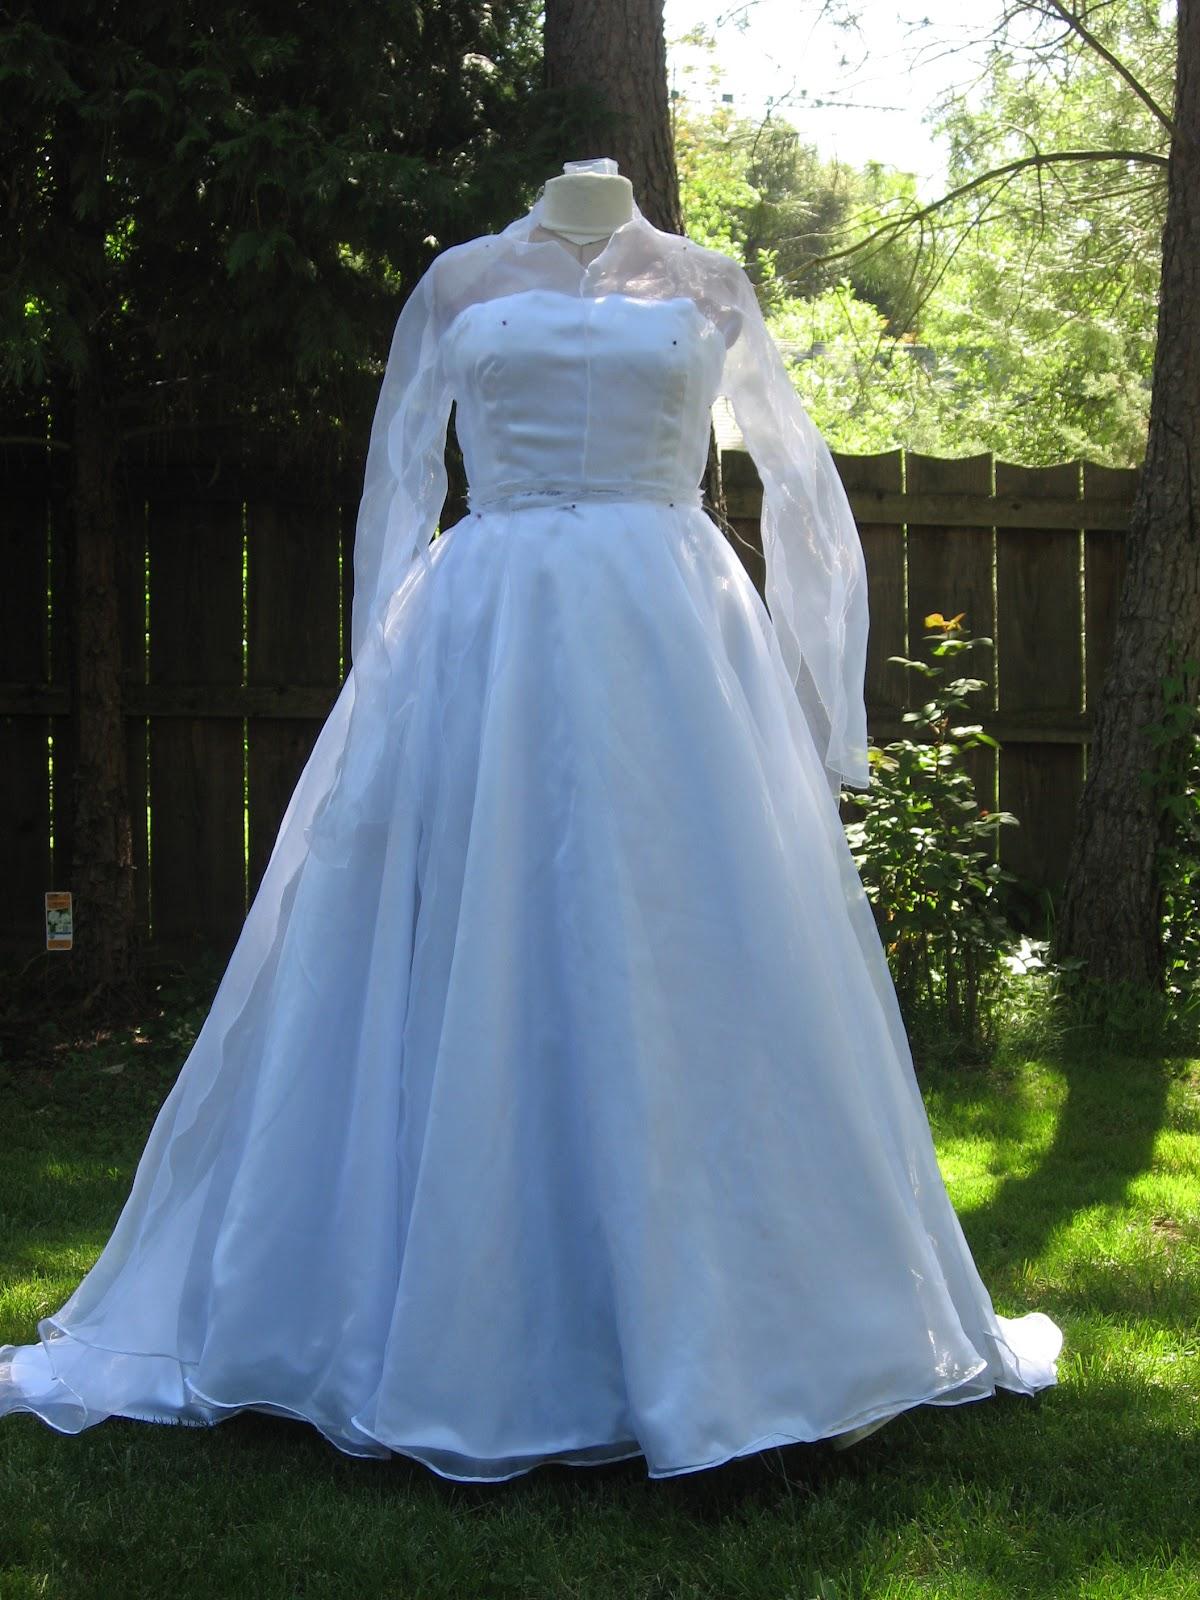 Madame Seiver sews: June 2012